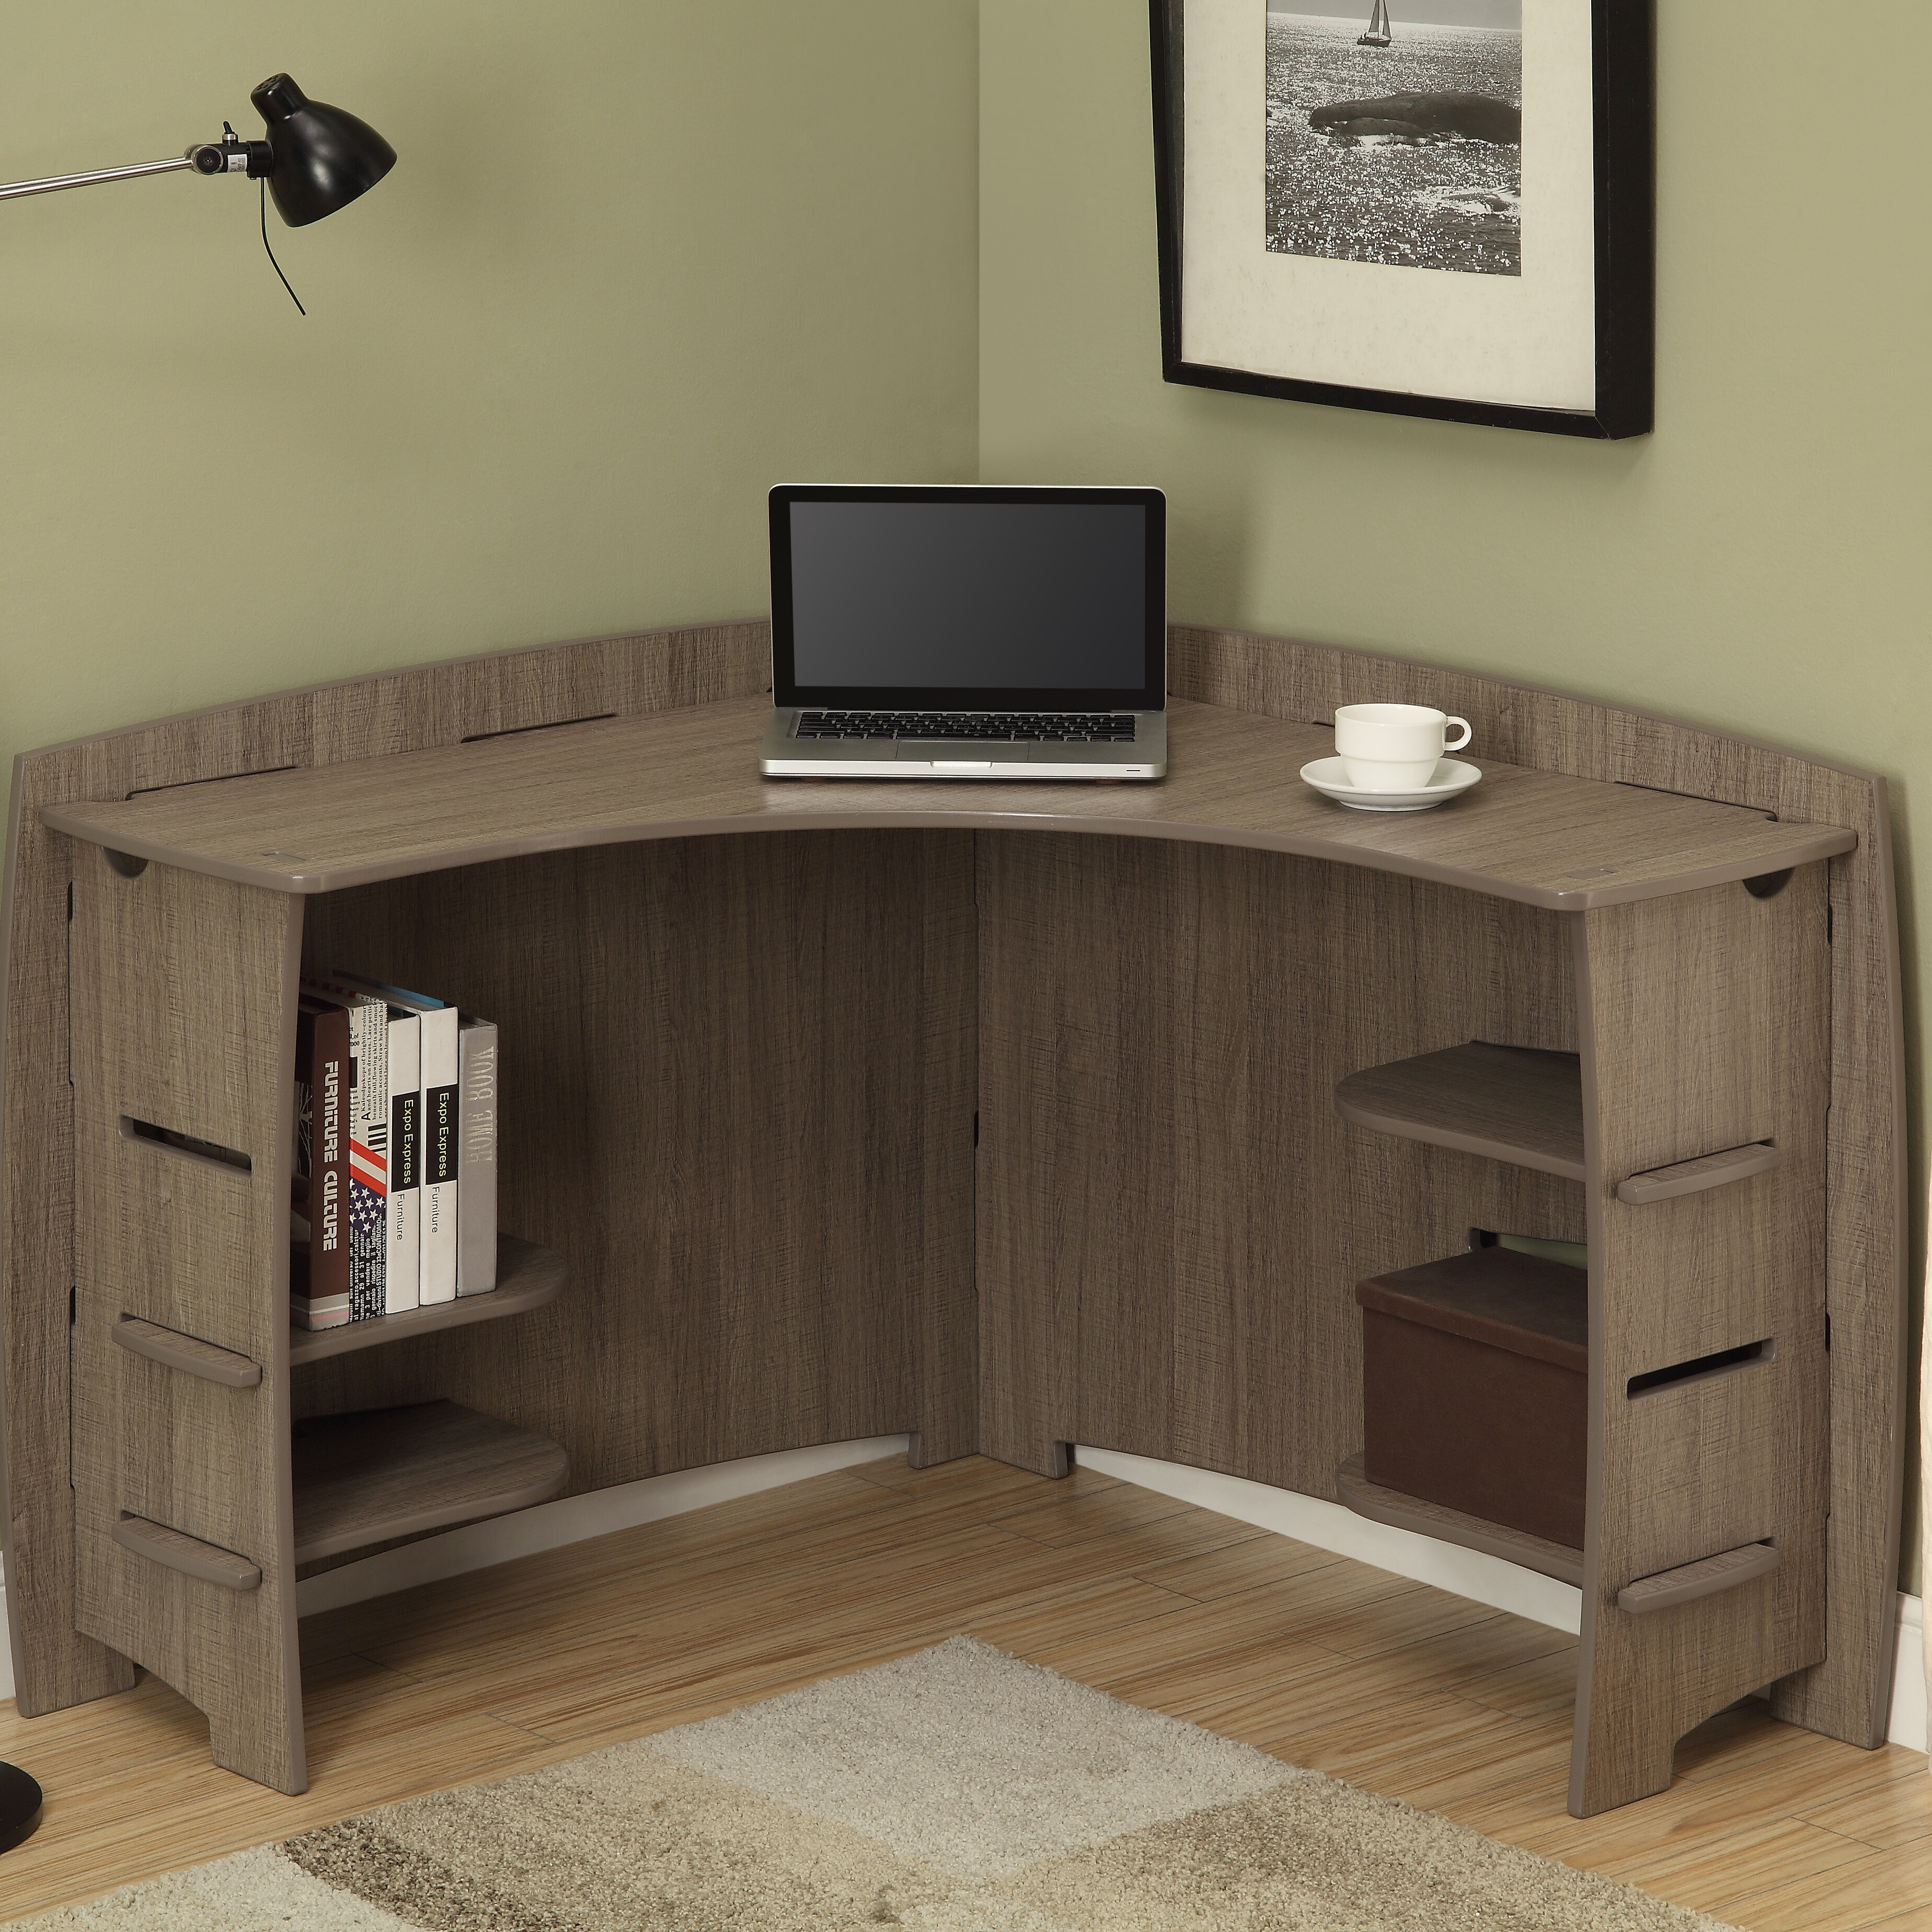 Legare Furniture Driftwood Corner Desk U0026 Reviews | Wayfair